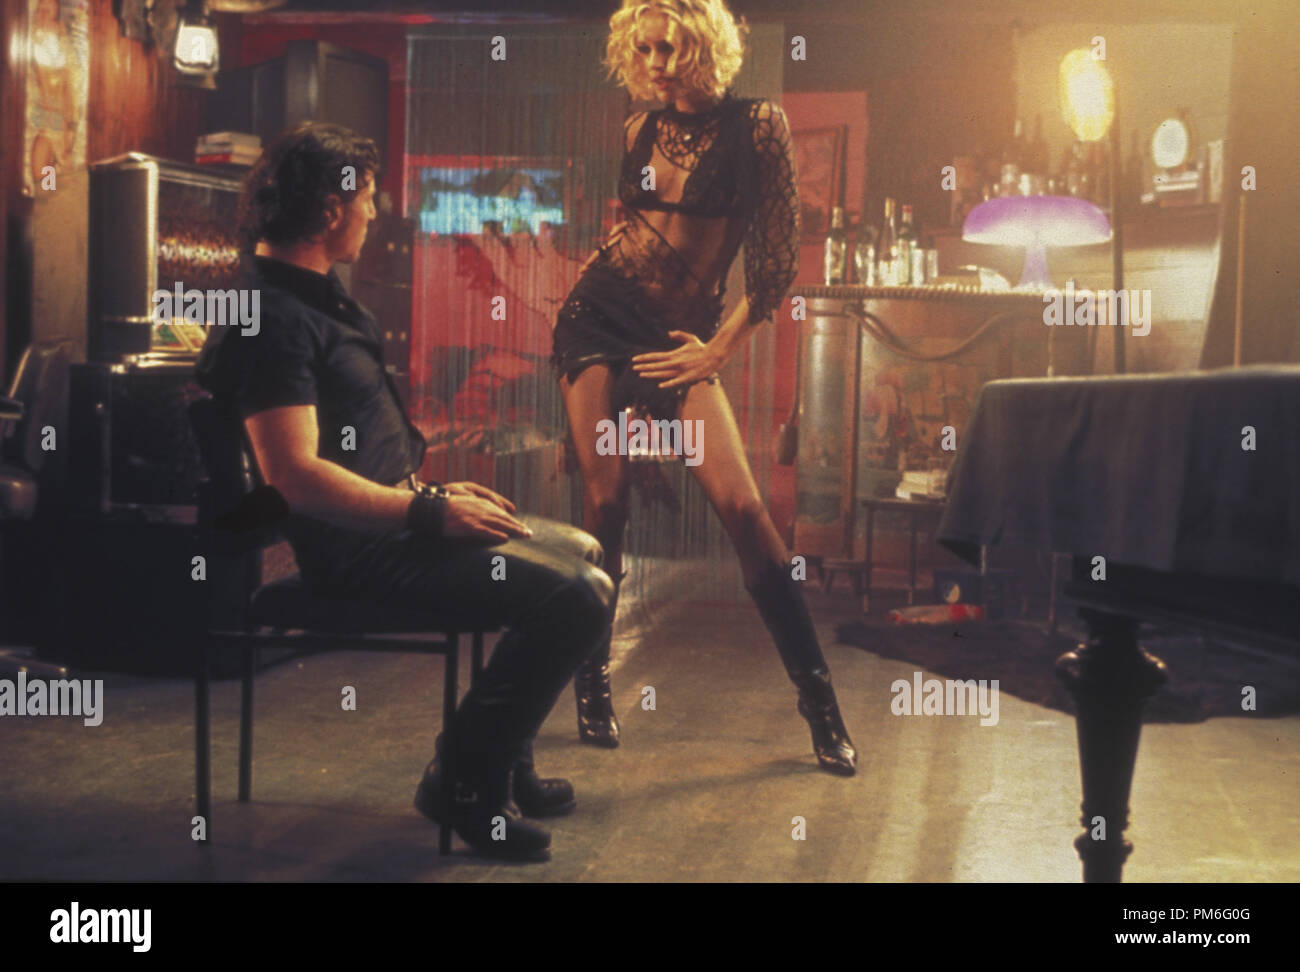 Rebecca romijn and rie rasmussen lesbo scene in femme fatale movie new foto